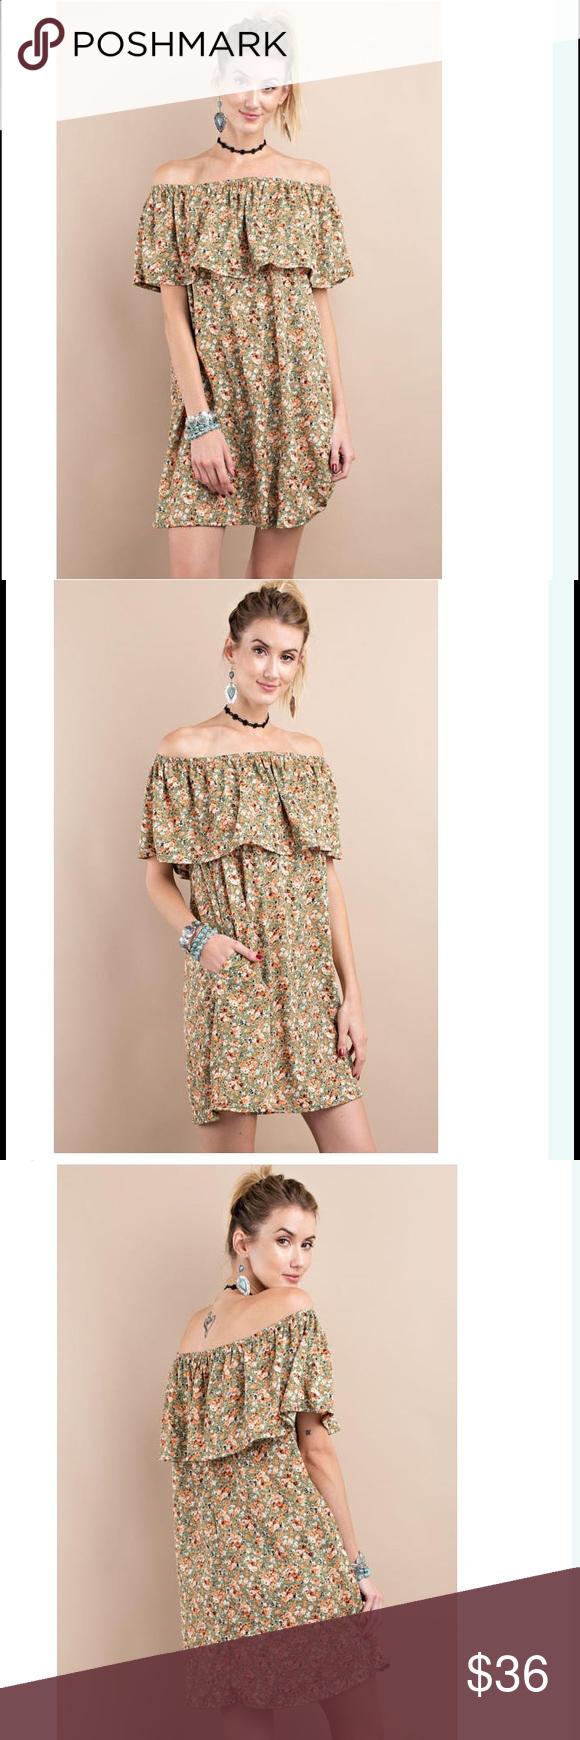 Off the shoulder layered dress Hidden side pockets // 96% polyester, 4% spandex Dresses Mini